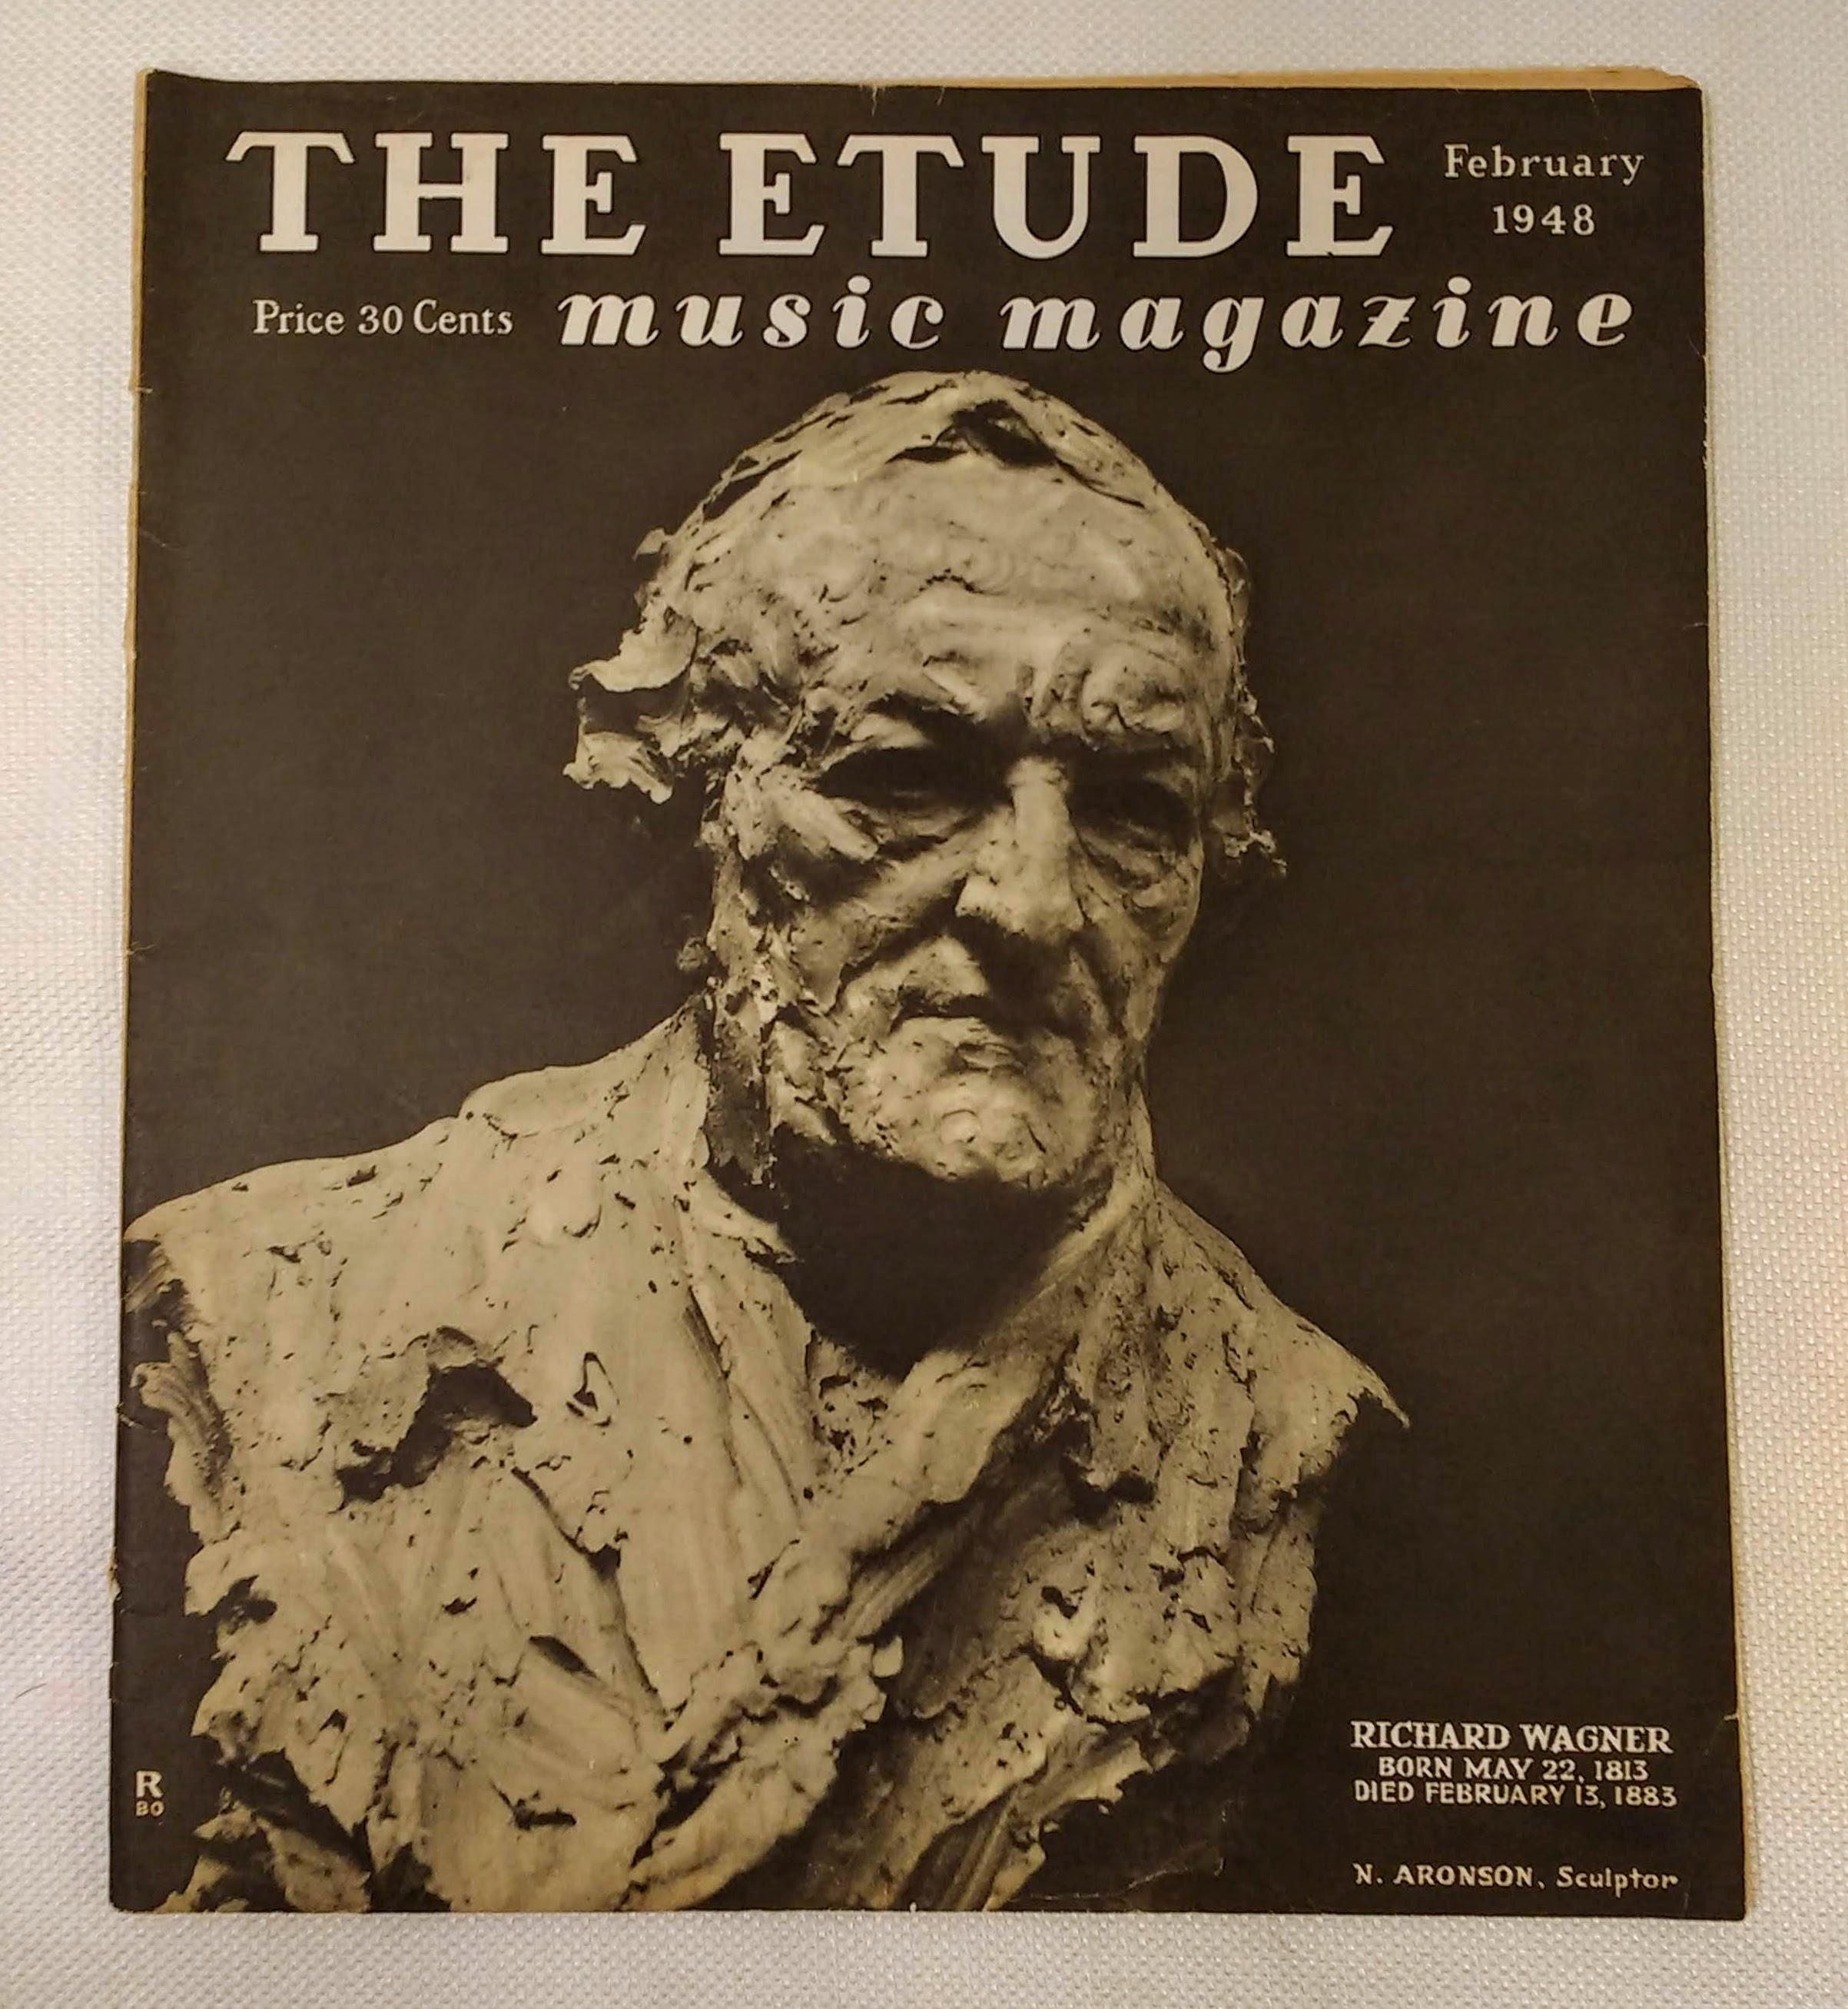 The Etude Music Magazine: Volume LXVI, No. 2; February, 1948, Cooke, James Francis [ed.]